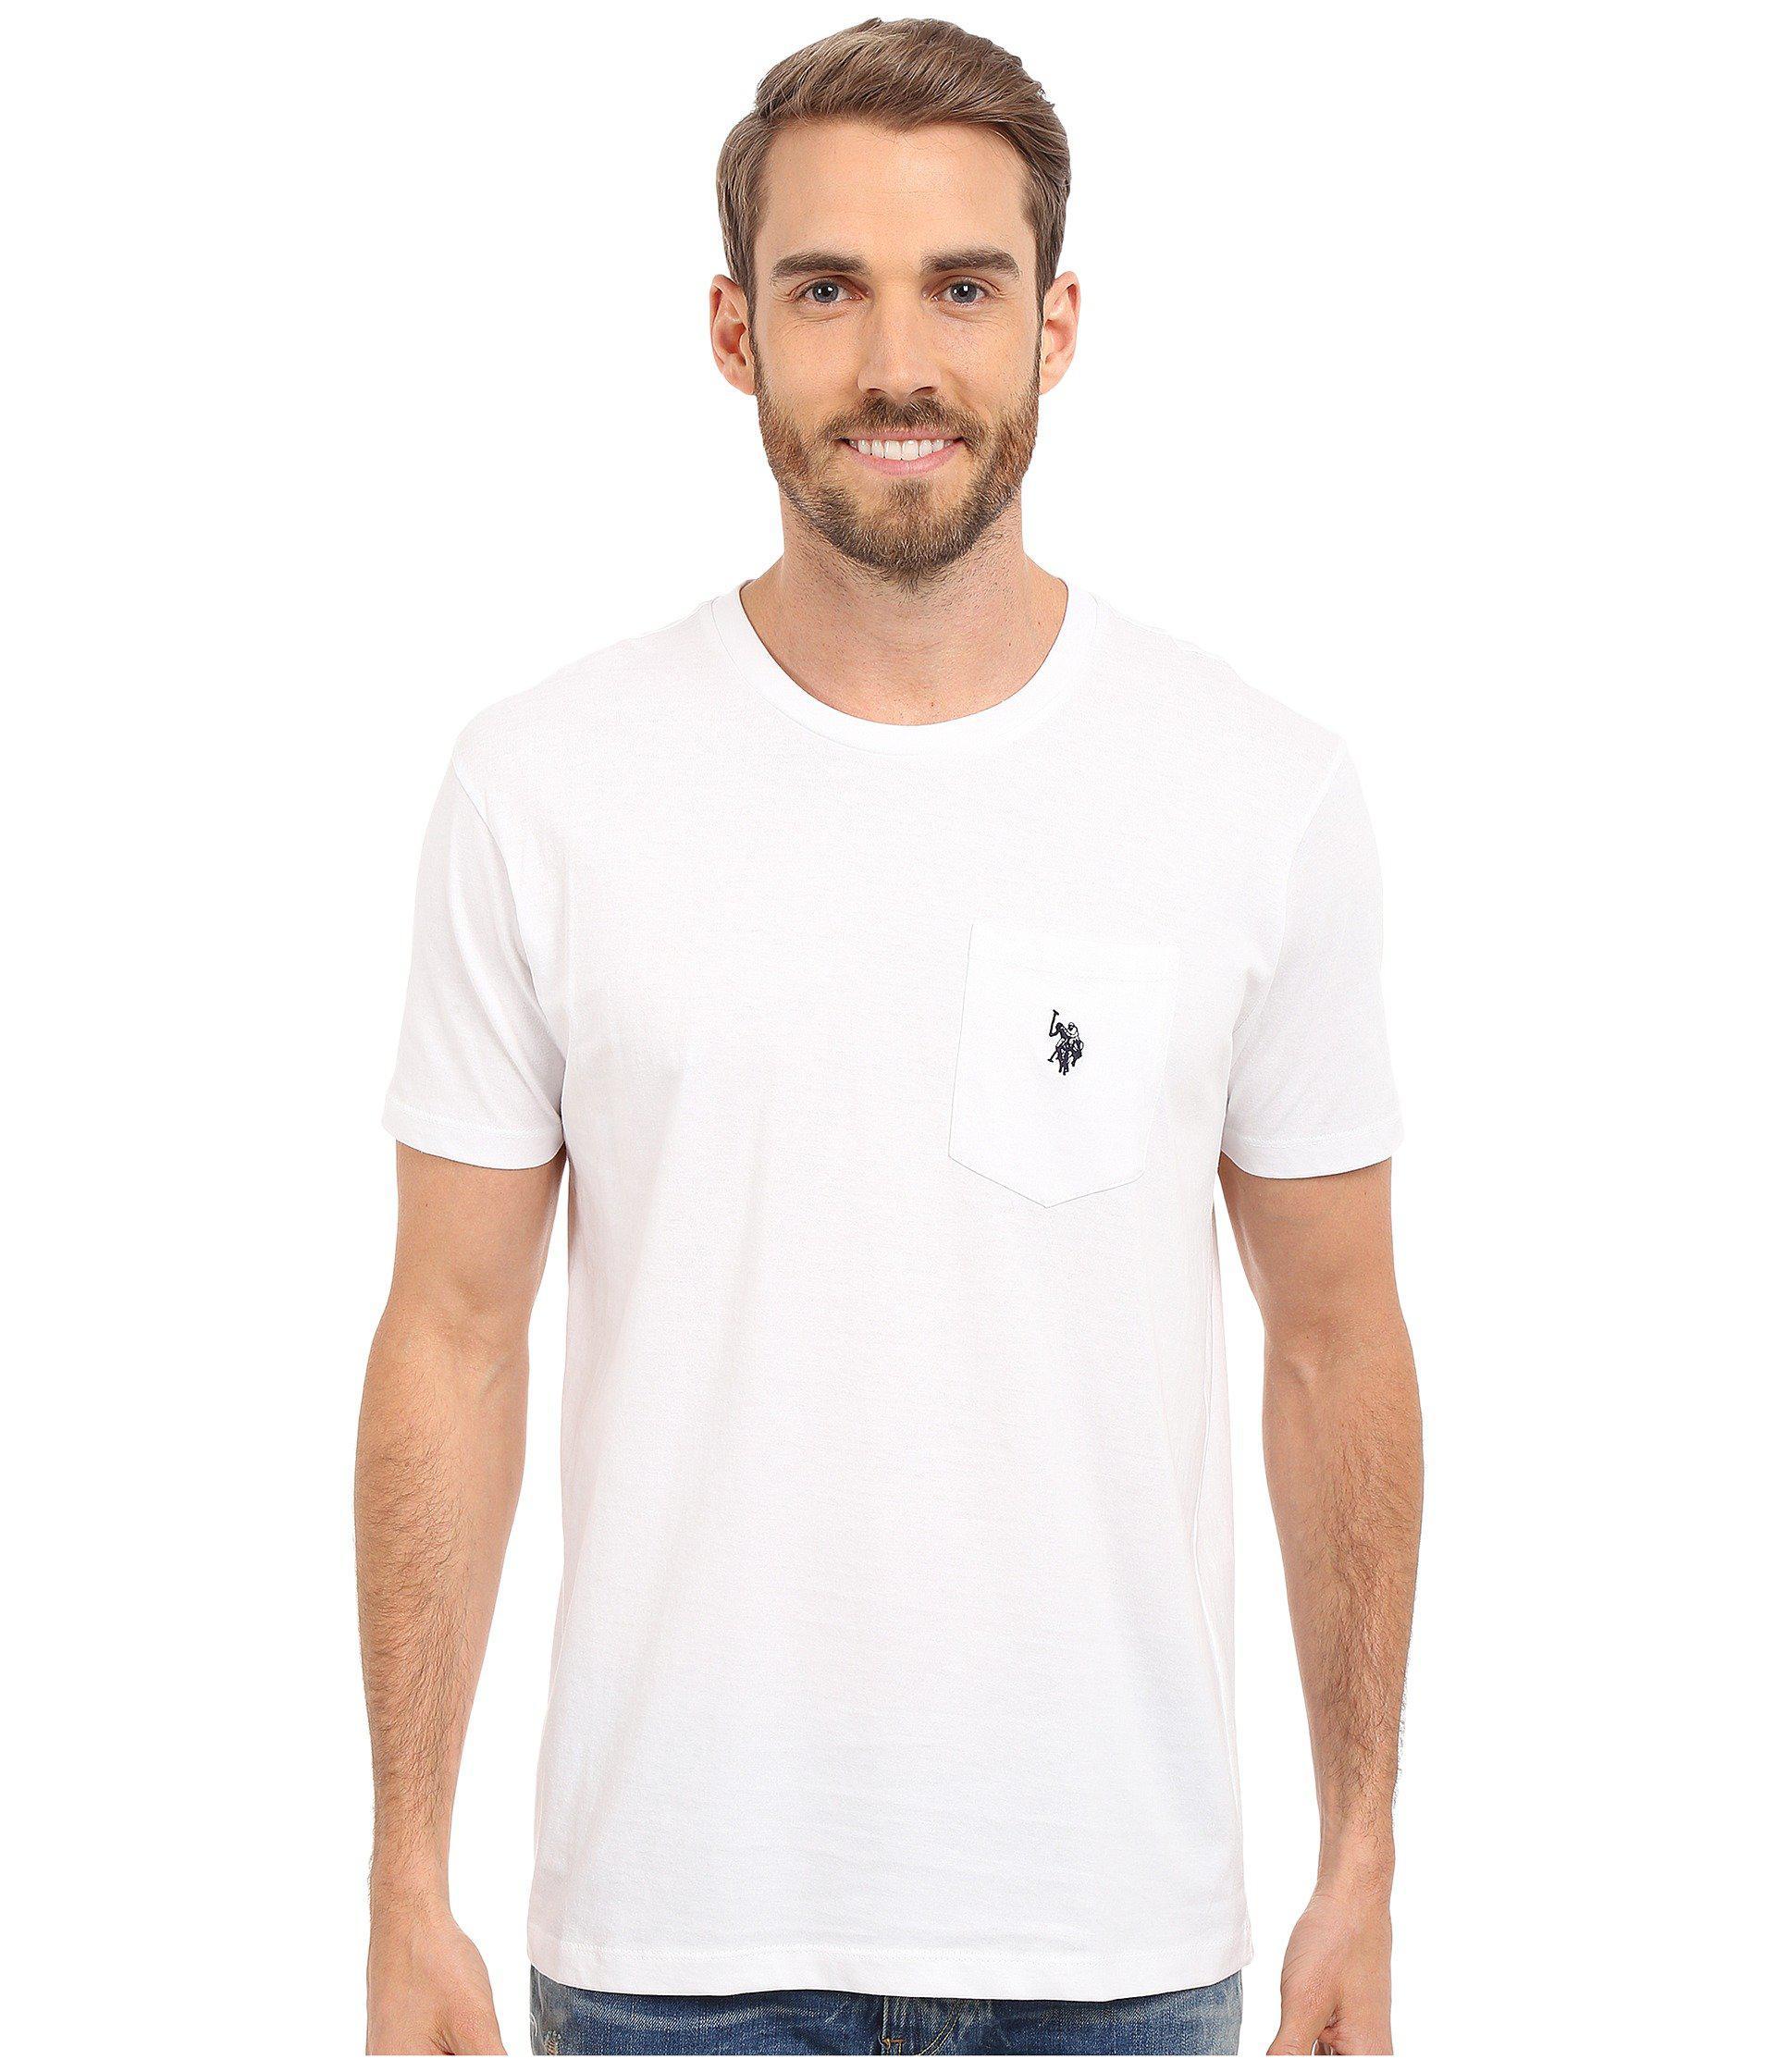 U S Polo Assn White T Shirt